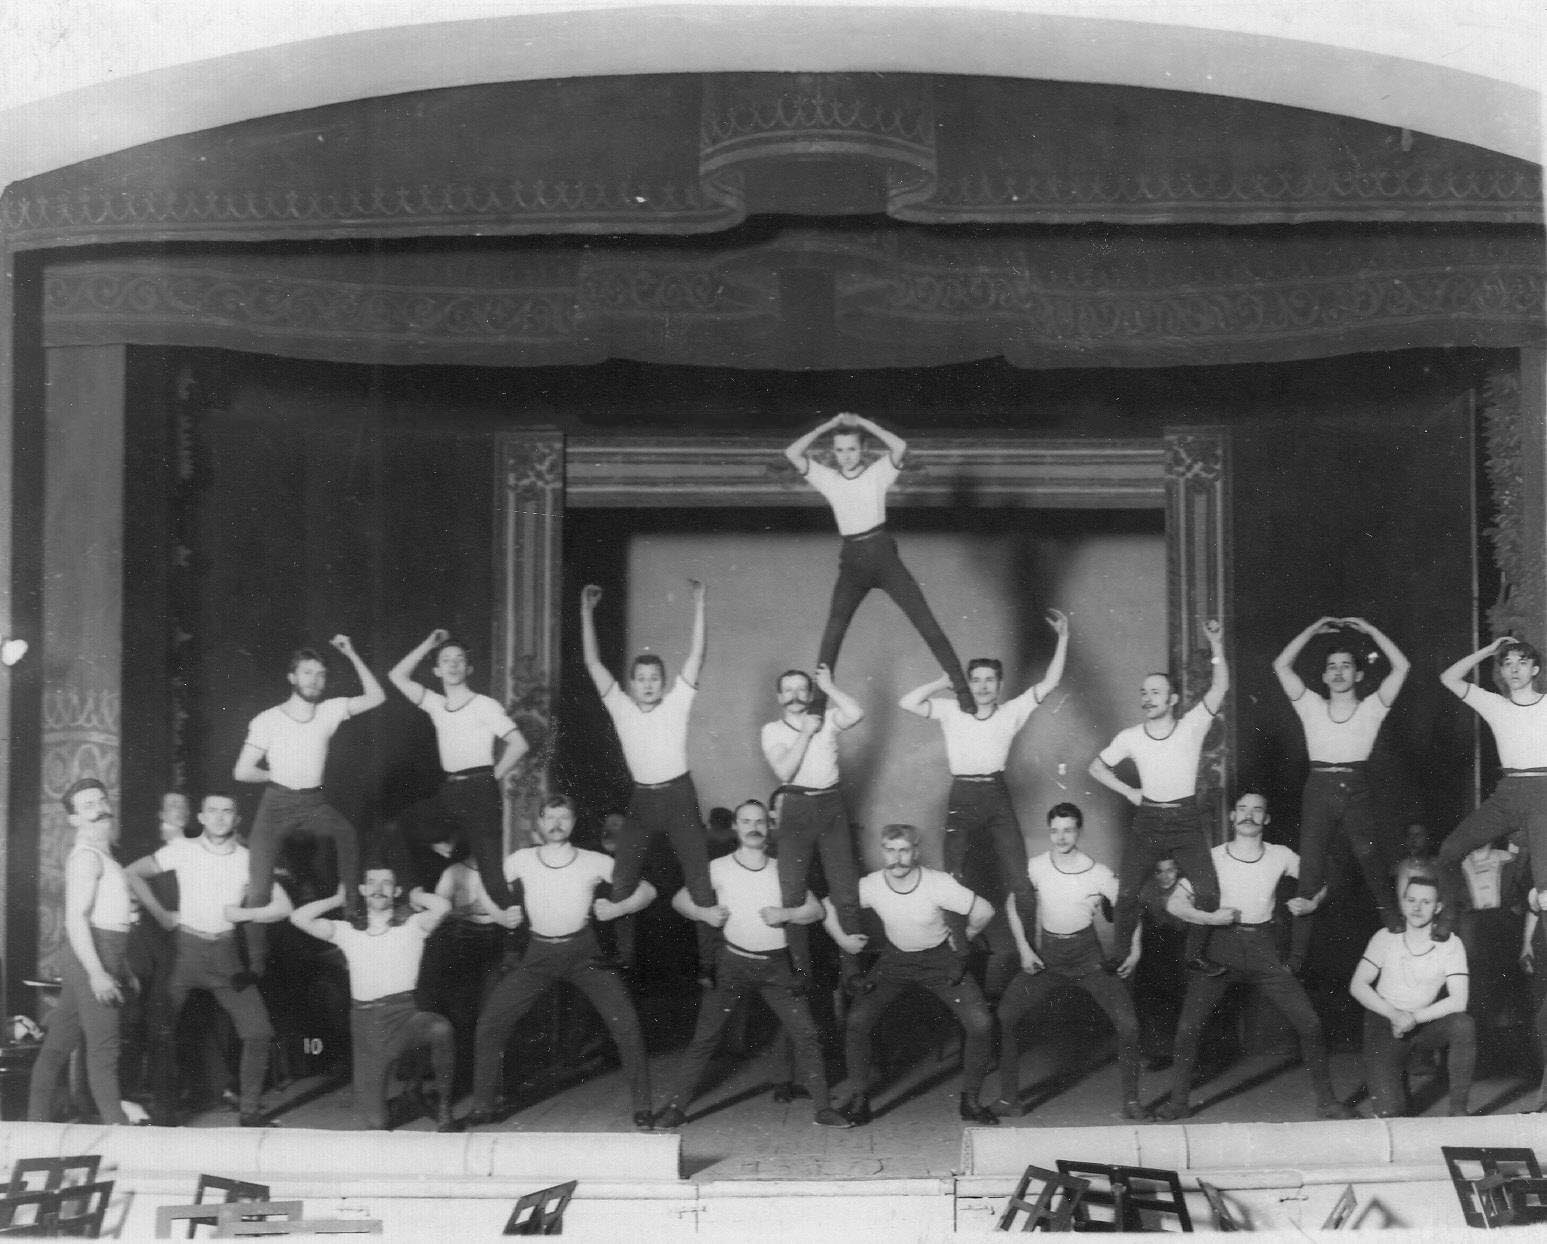 Группа гимнастов на сцене. 1907